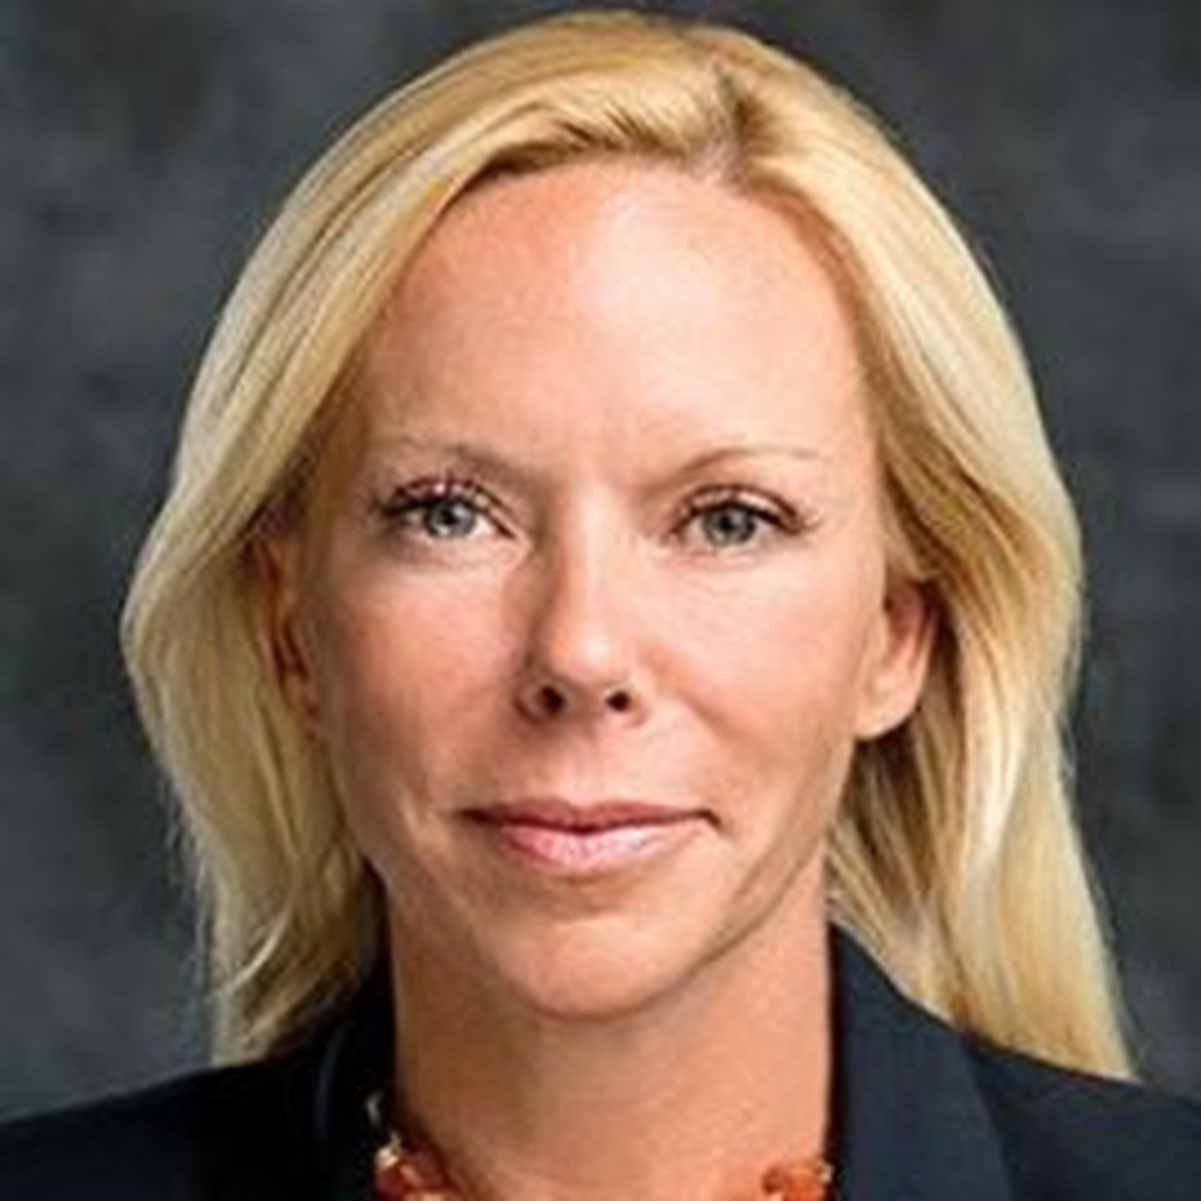 Saundra Pelletier